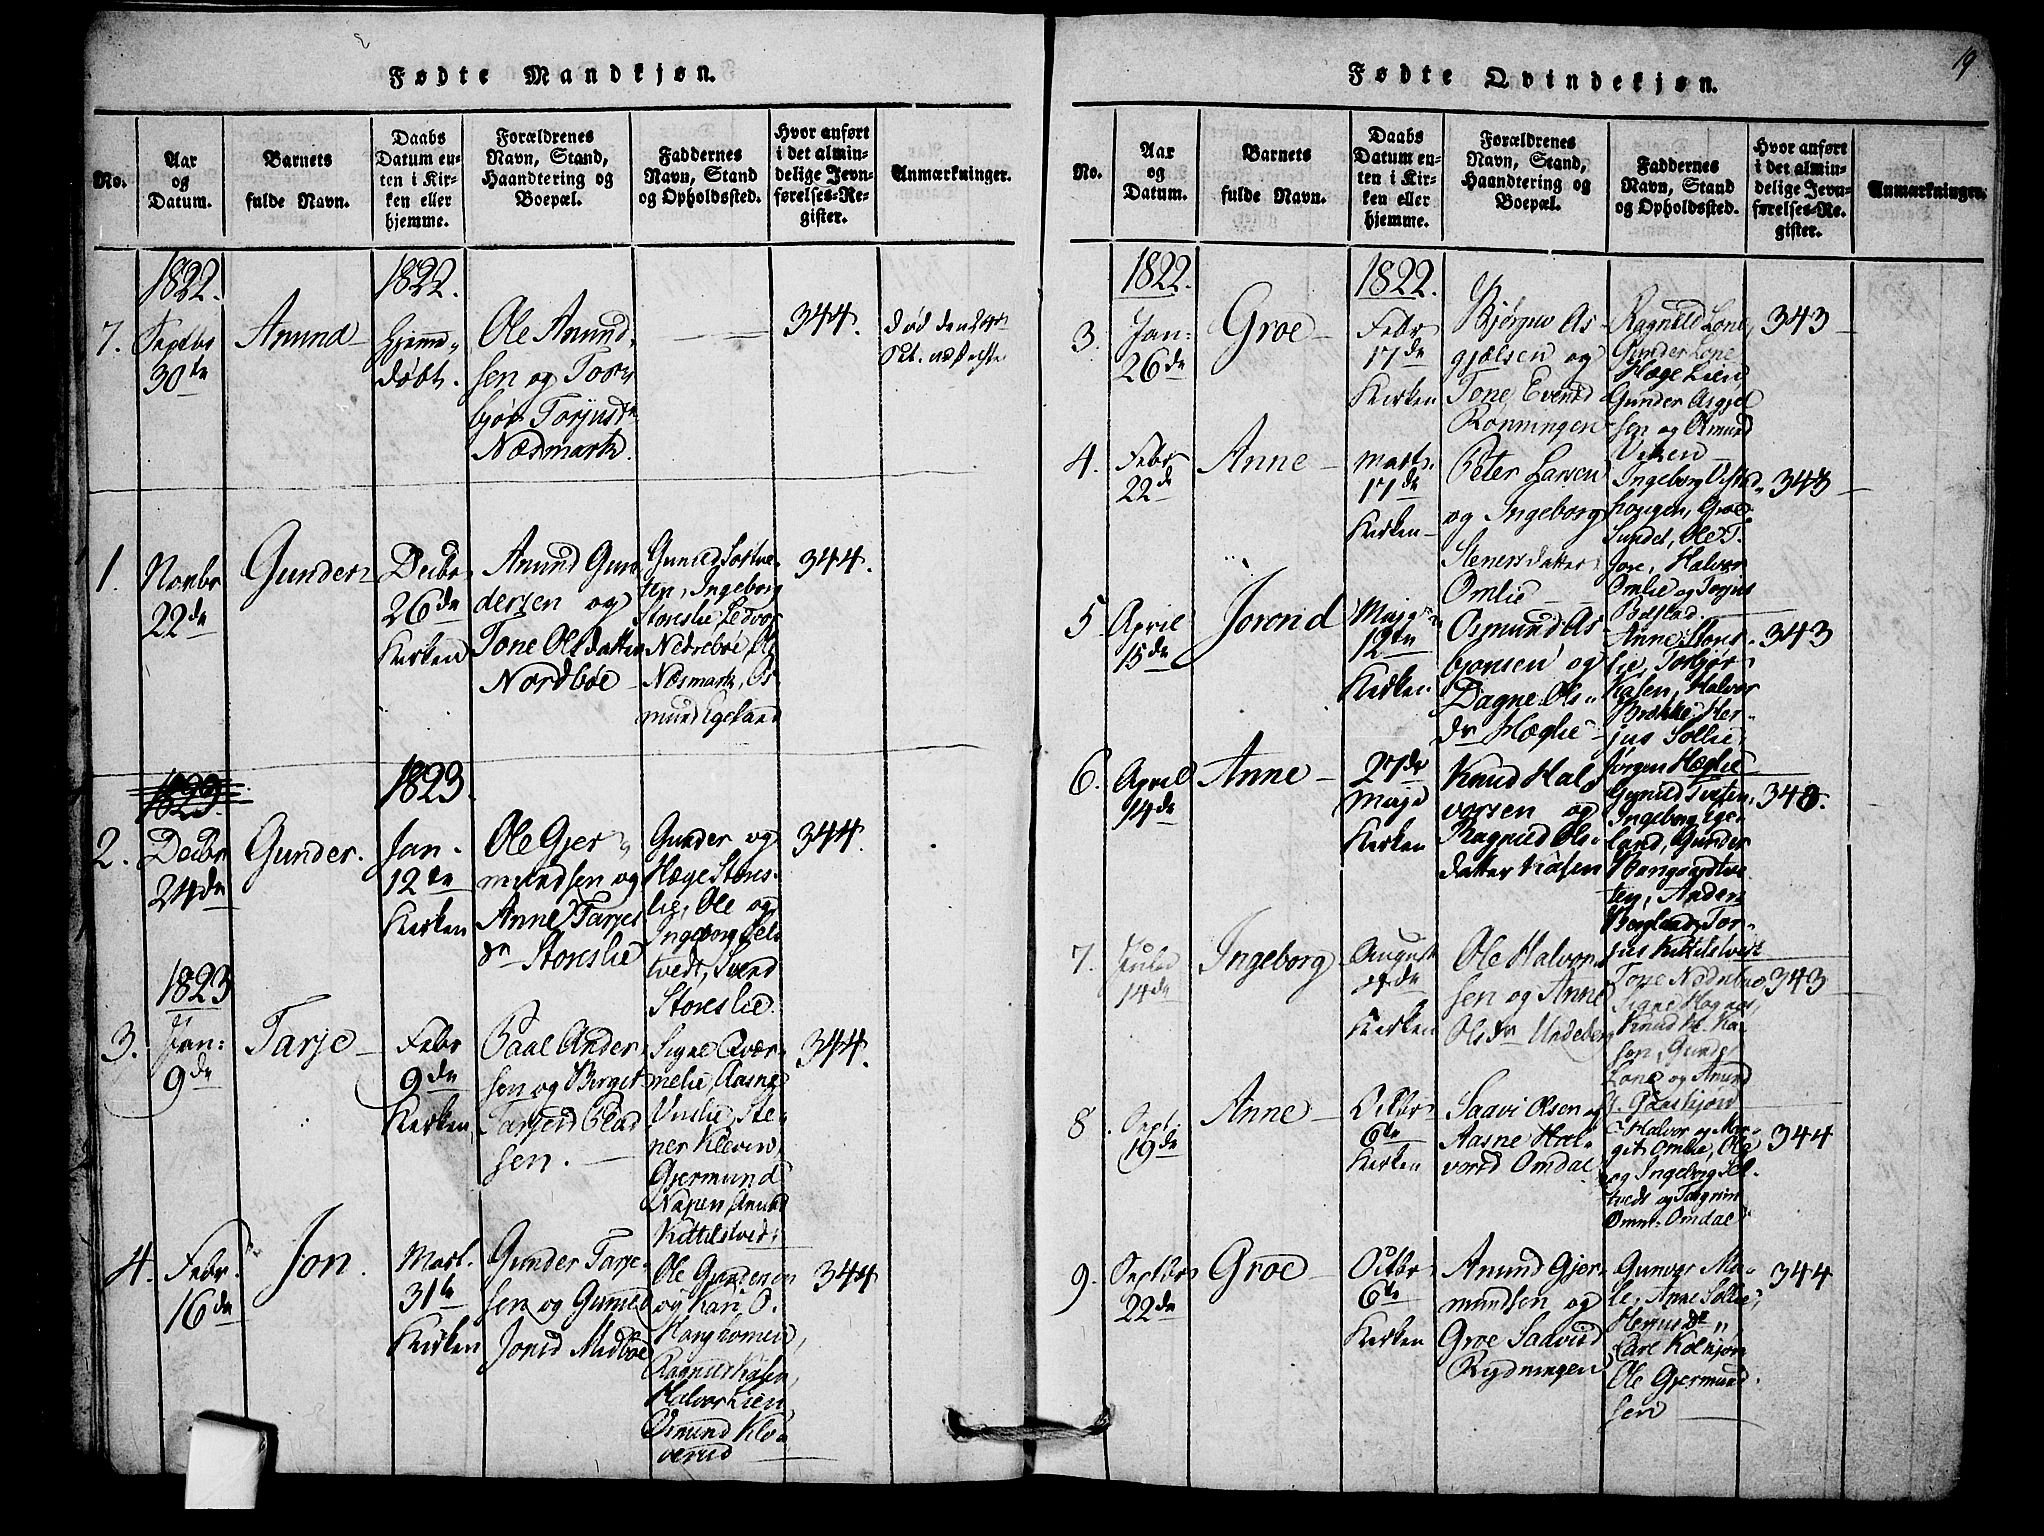 SAKO, Mo kirkebøker, F/Fb/L0001: Ministerialbok nr. II 1, 1814-1844, s. 19